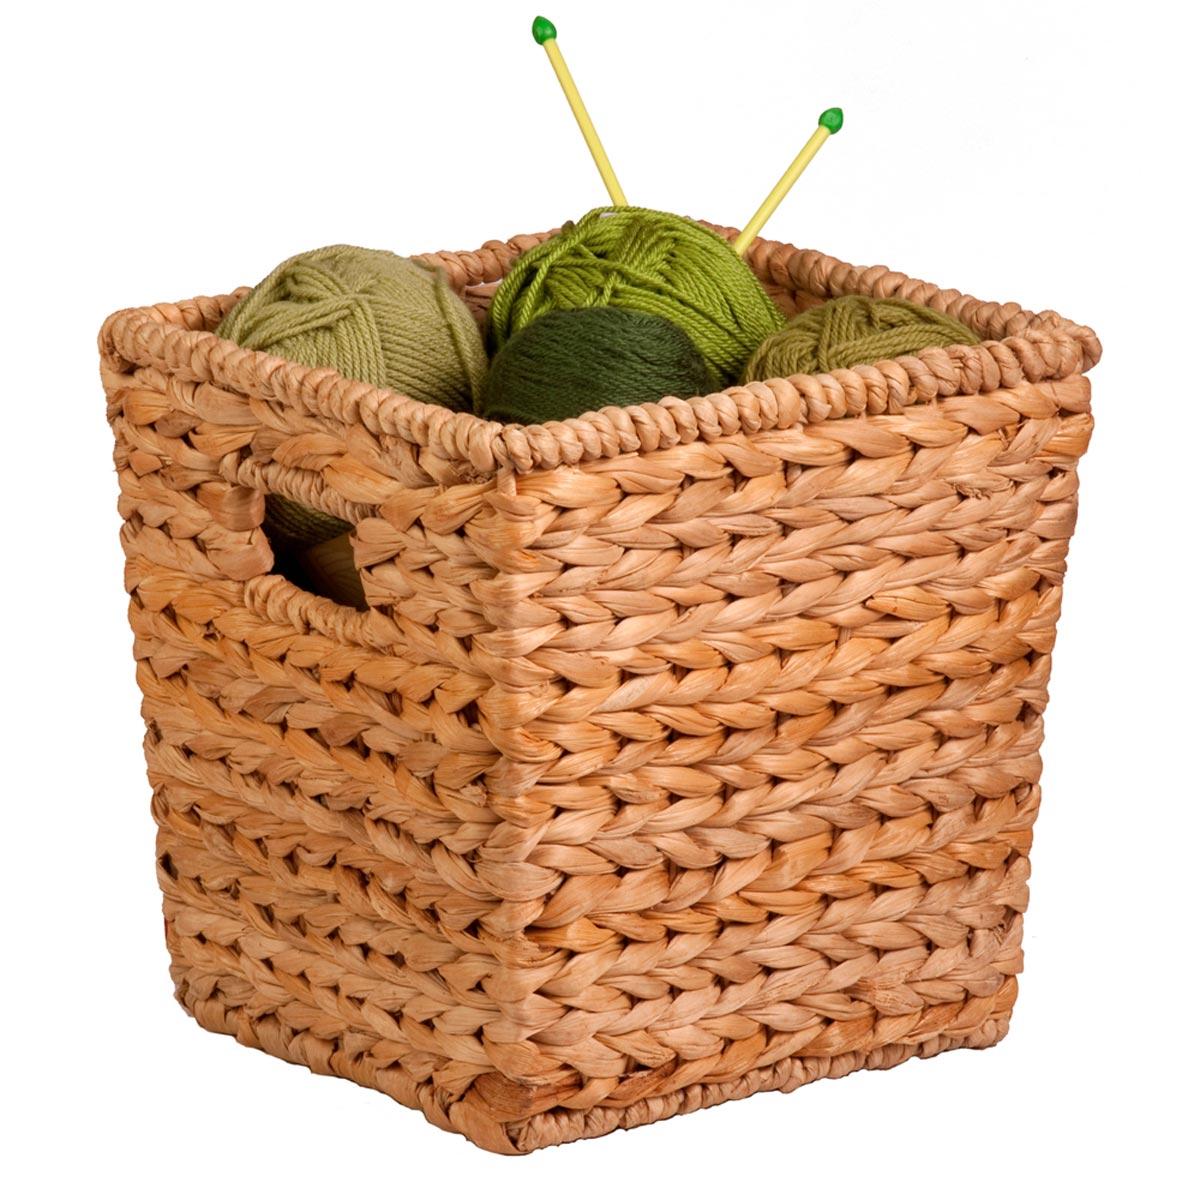 10.5 in. x 10.5 in. x 10.5 in. Square Natural Hyacinth Storage Basket, Medium